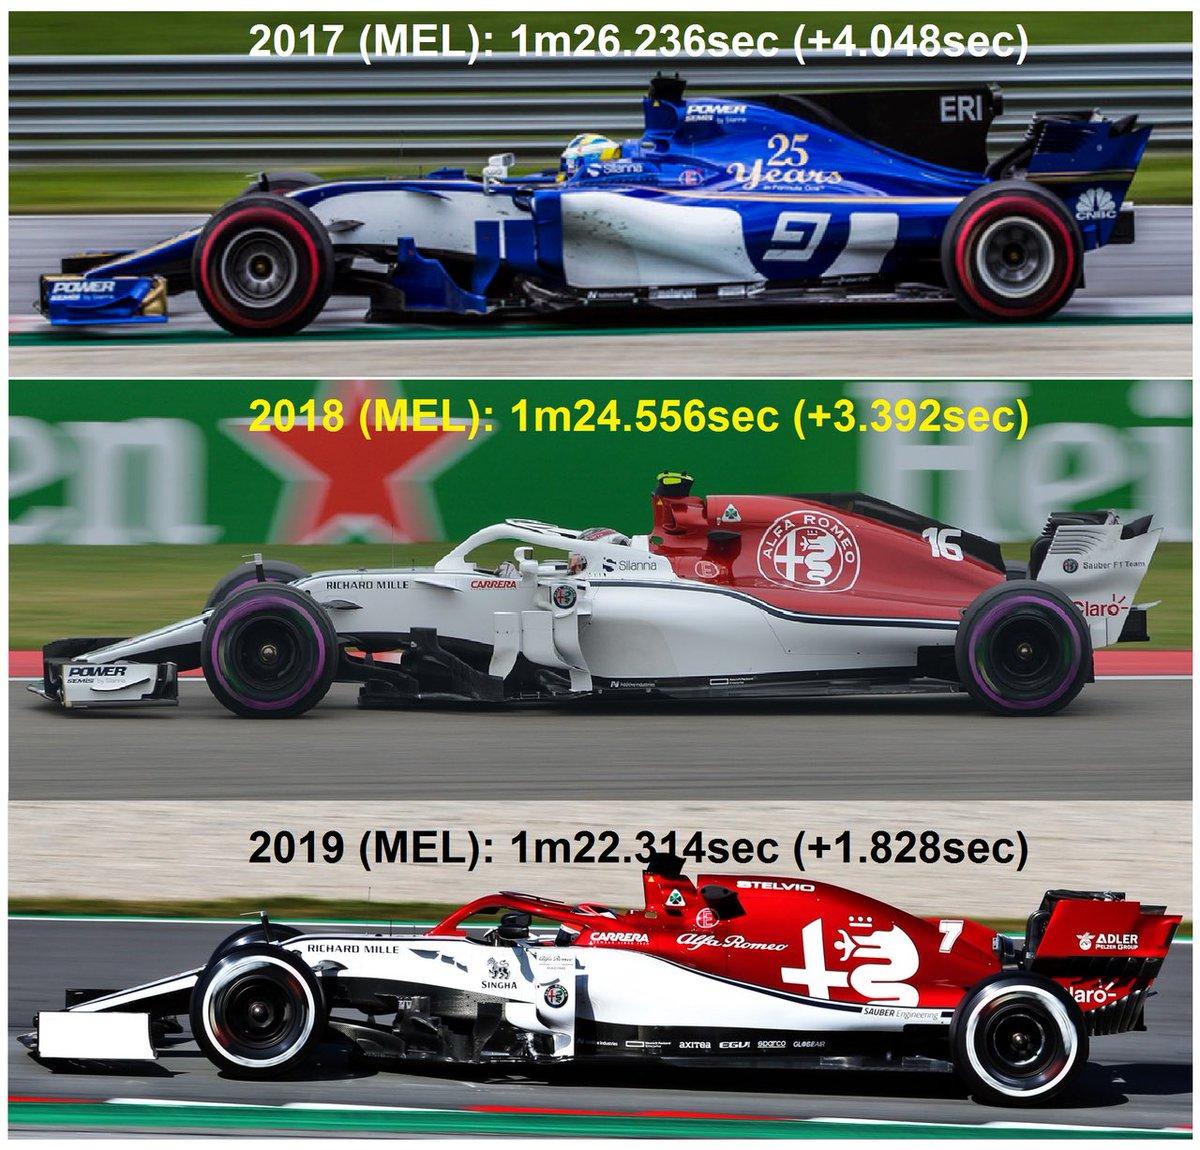 [] Nothing to add ... It&#39;s the work of a dream team !   #F1 #AlfaRomeo #AlfaRomeoRacing #Kimi7 #AG99<br>http://pic.twitter.com/dE8EsSMWJR